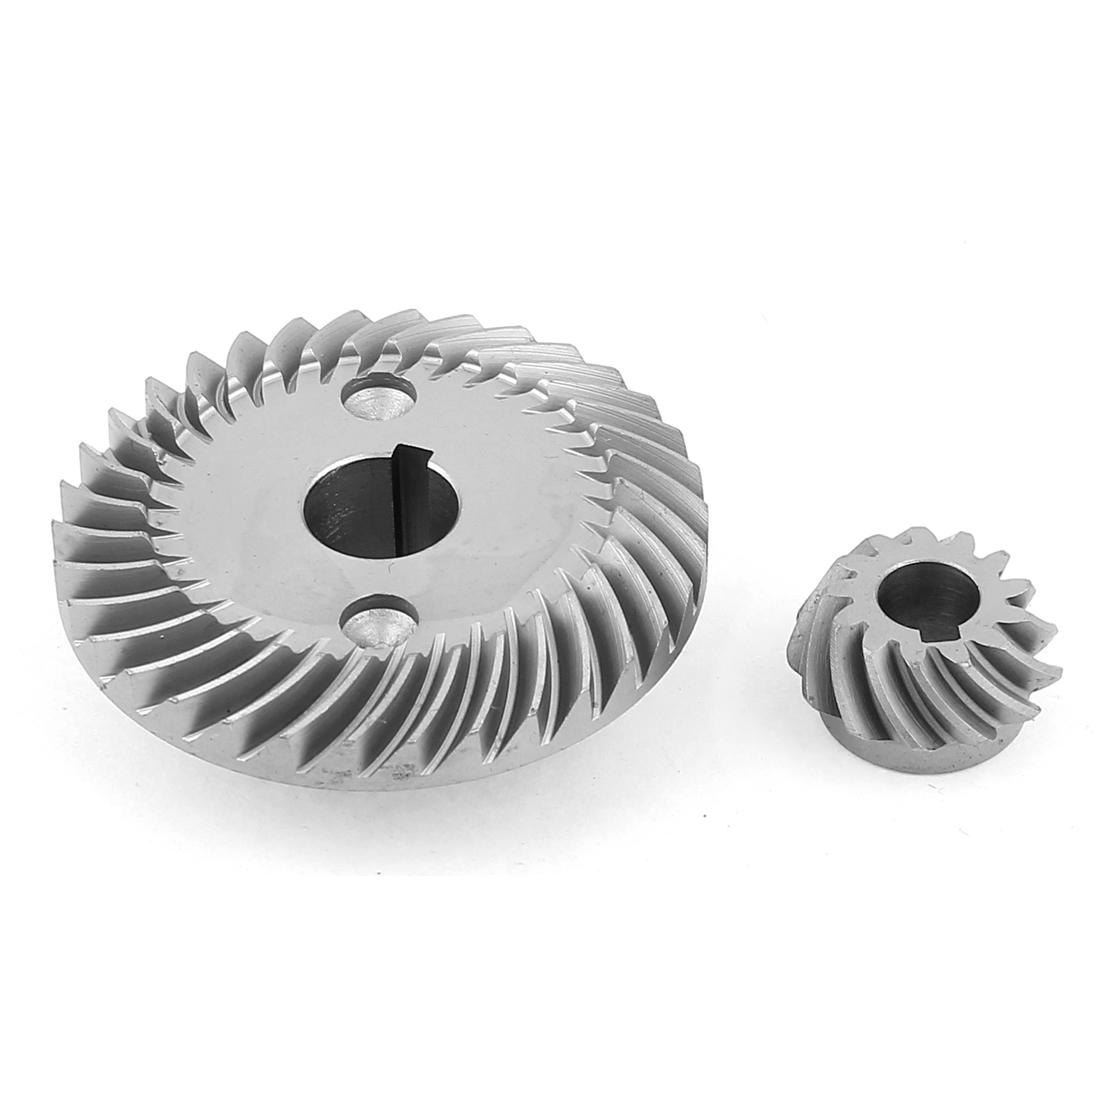 Slot Hole Metal Spiral Bevel Gear Pinion Set for Makita 9500 Angle Grinder